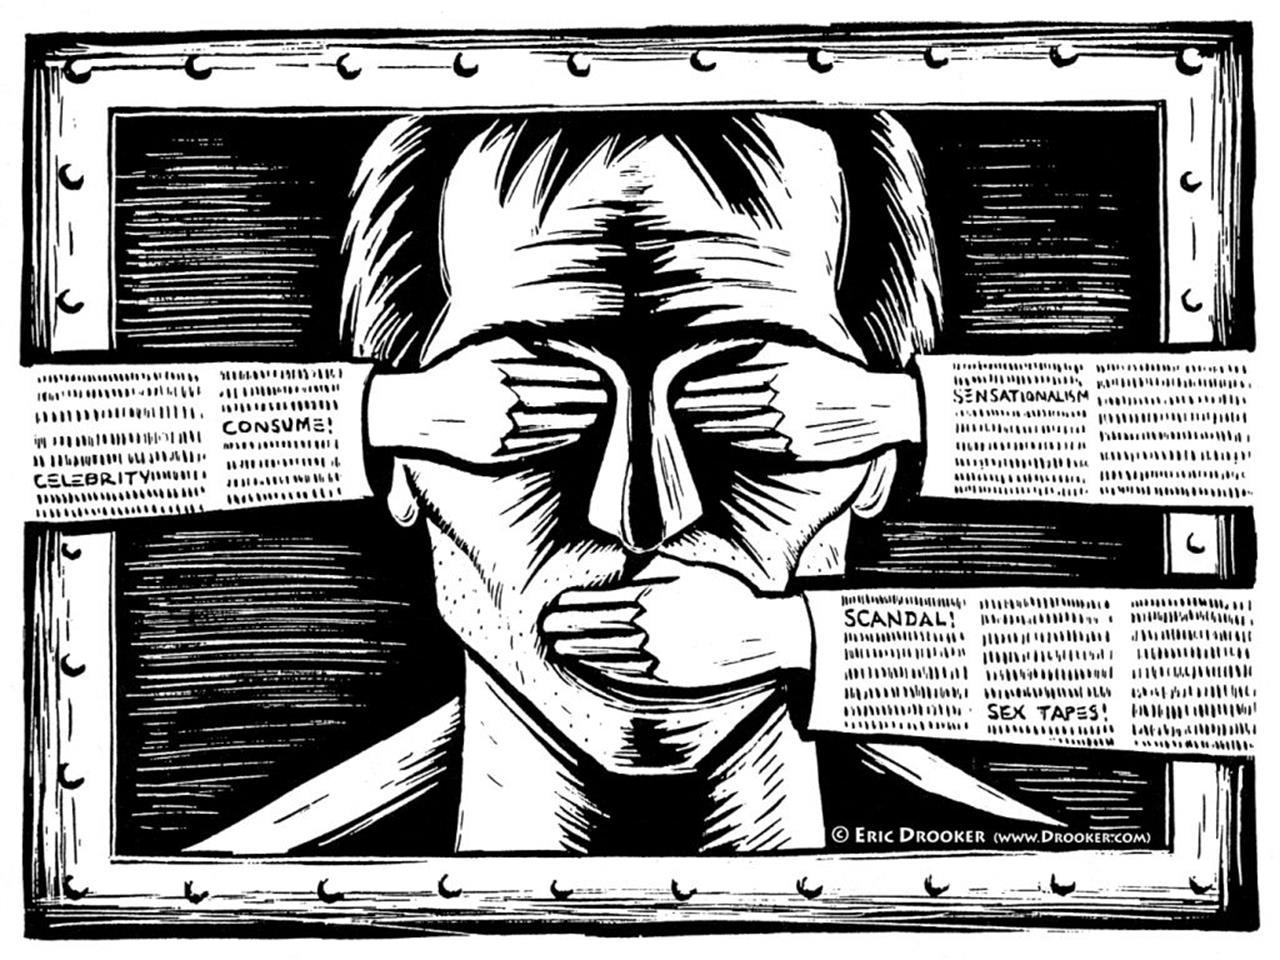 Censura fascista per arginare il fascismo